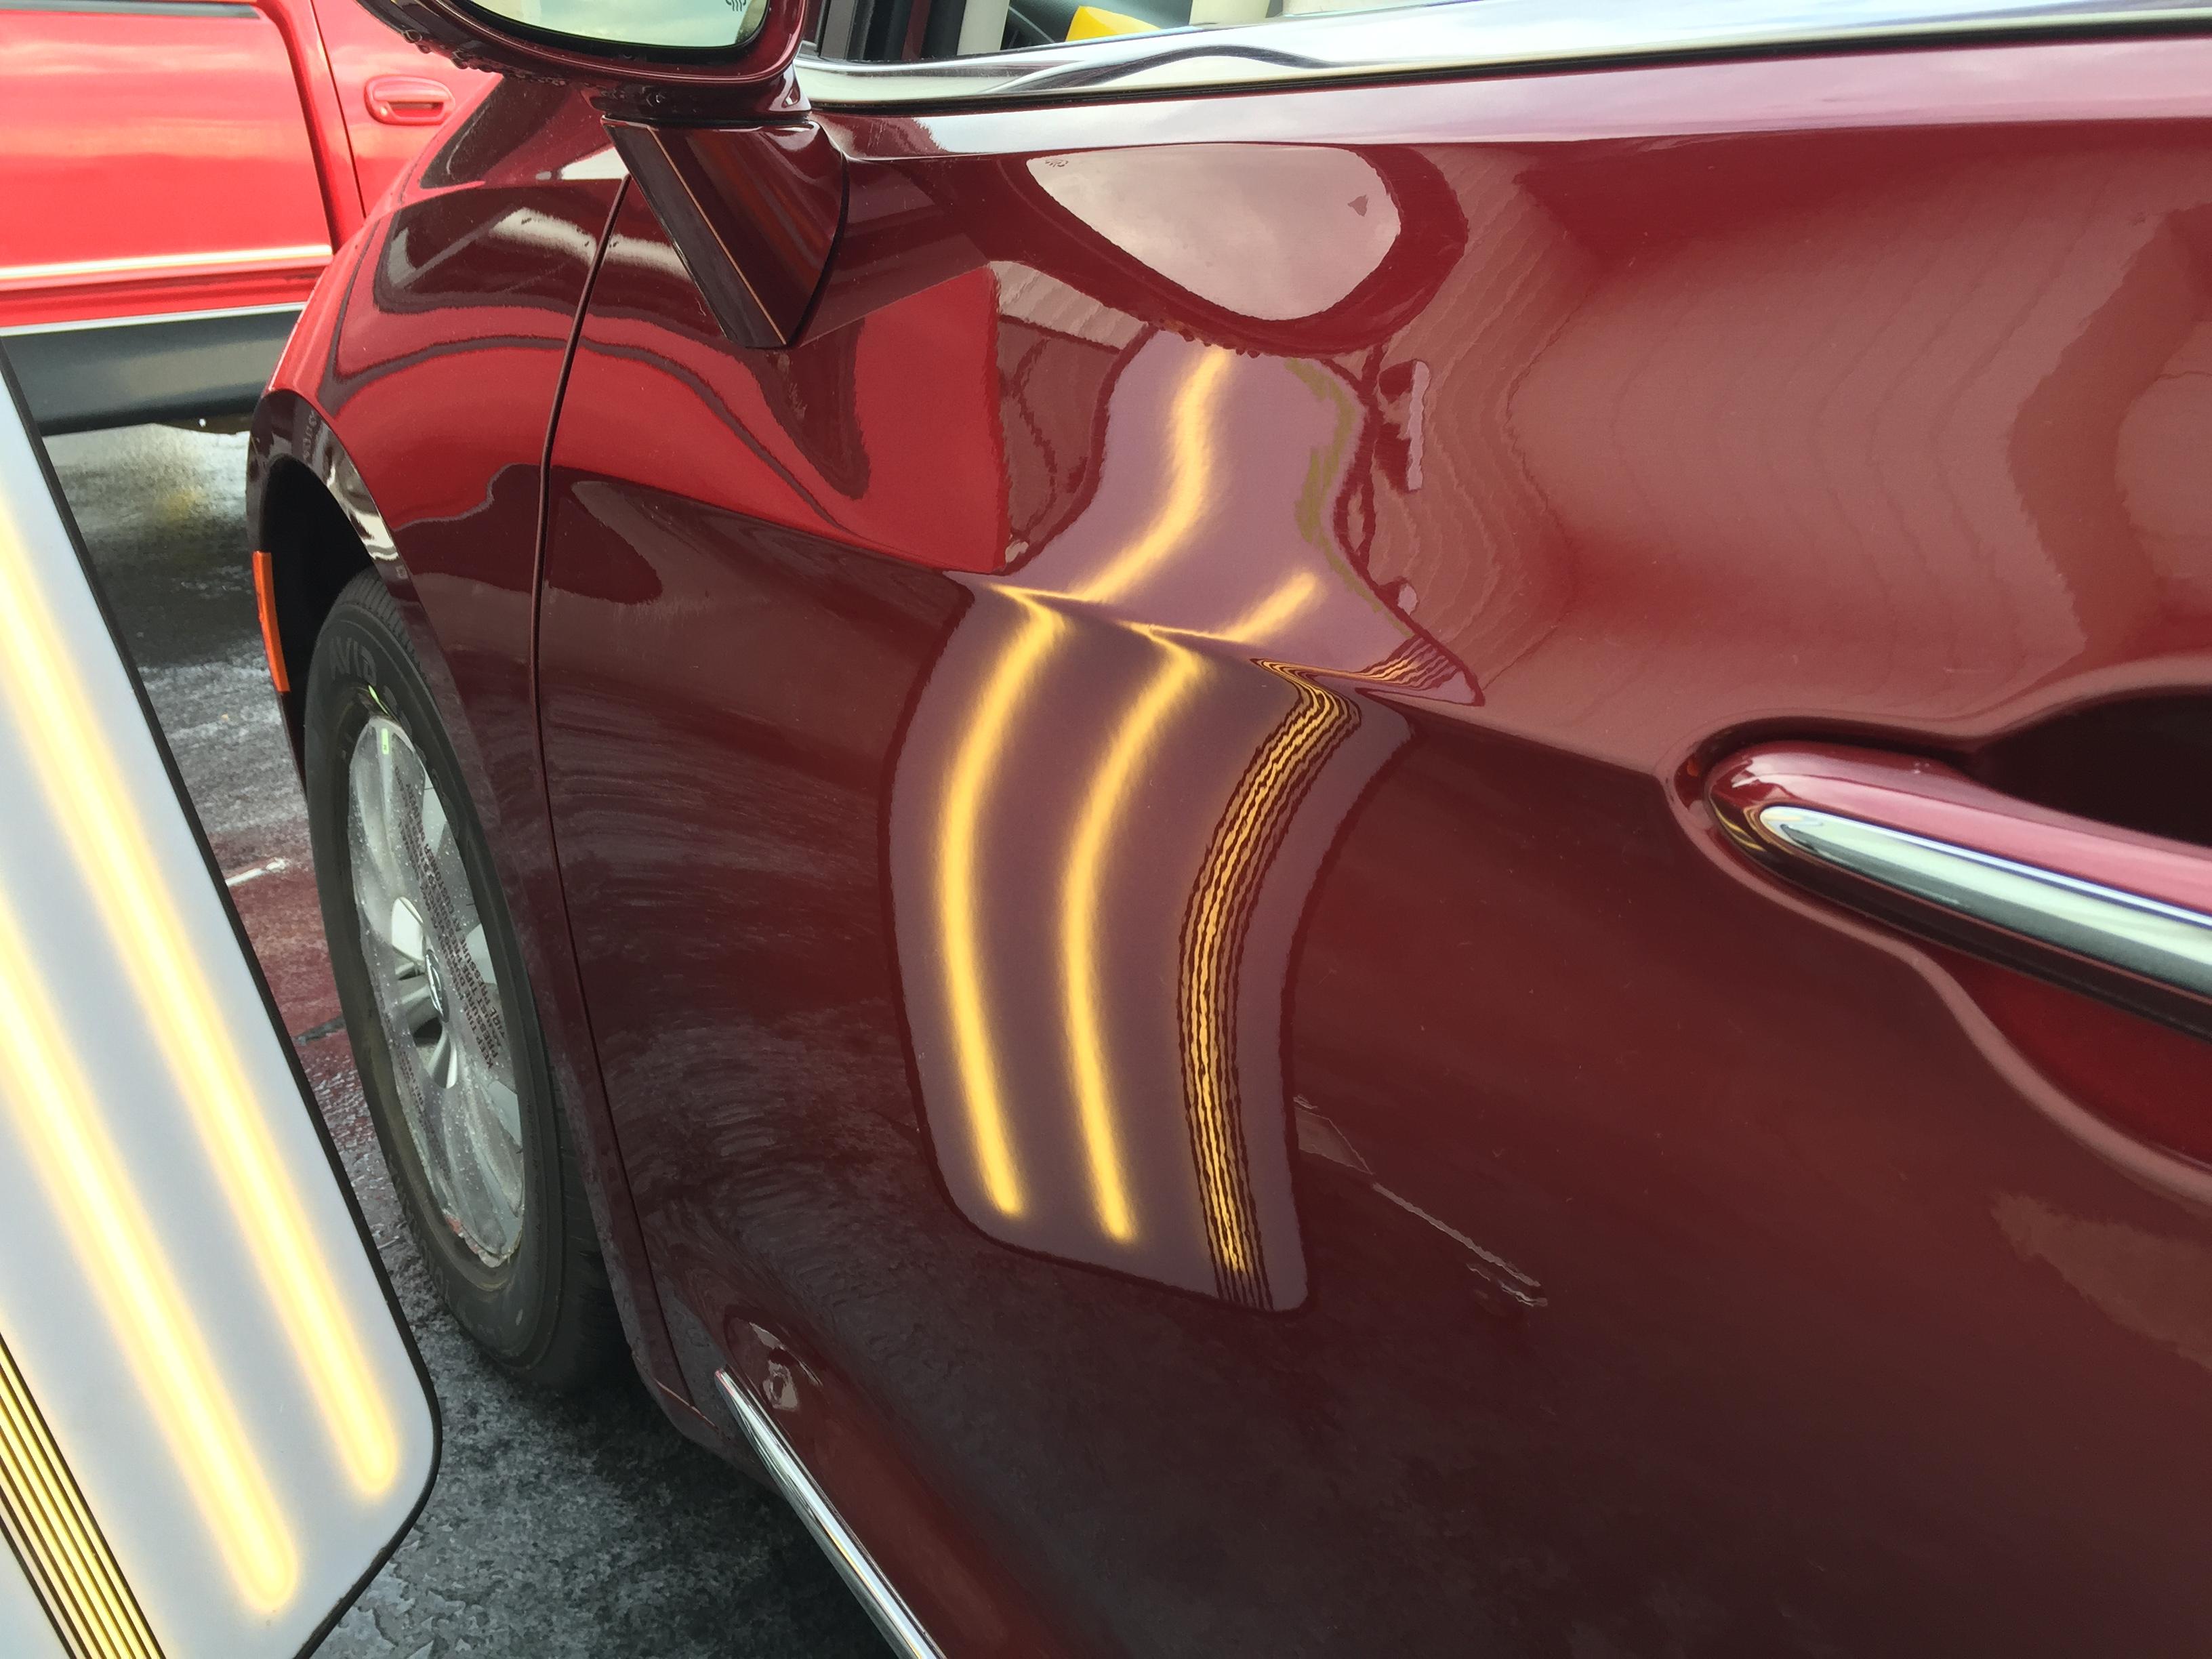 2017 Chrysler Pacifica Touring, Mobile dent Repair Springfield IL, Taylorville IL, Decatur IL, Sharp body line paintless dent repair by Michael Bocek